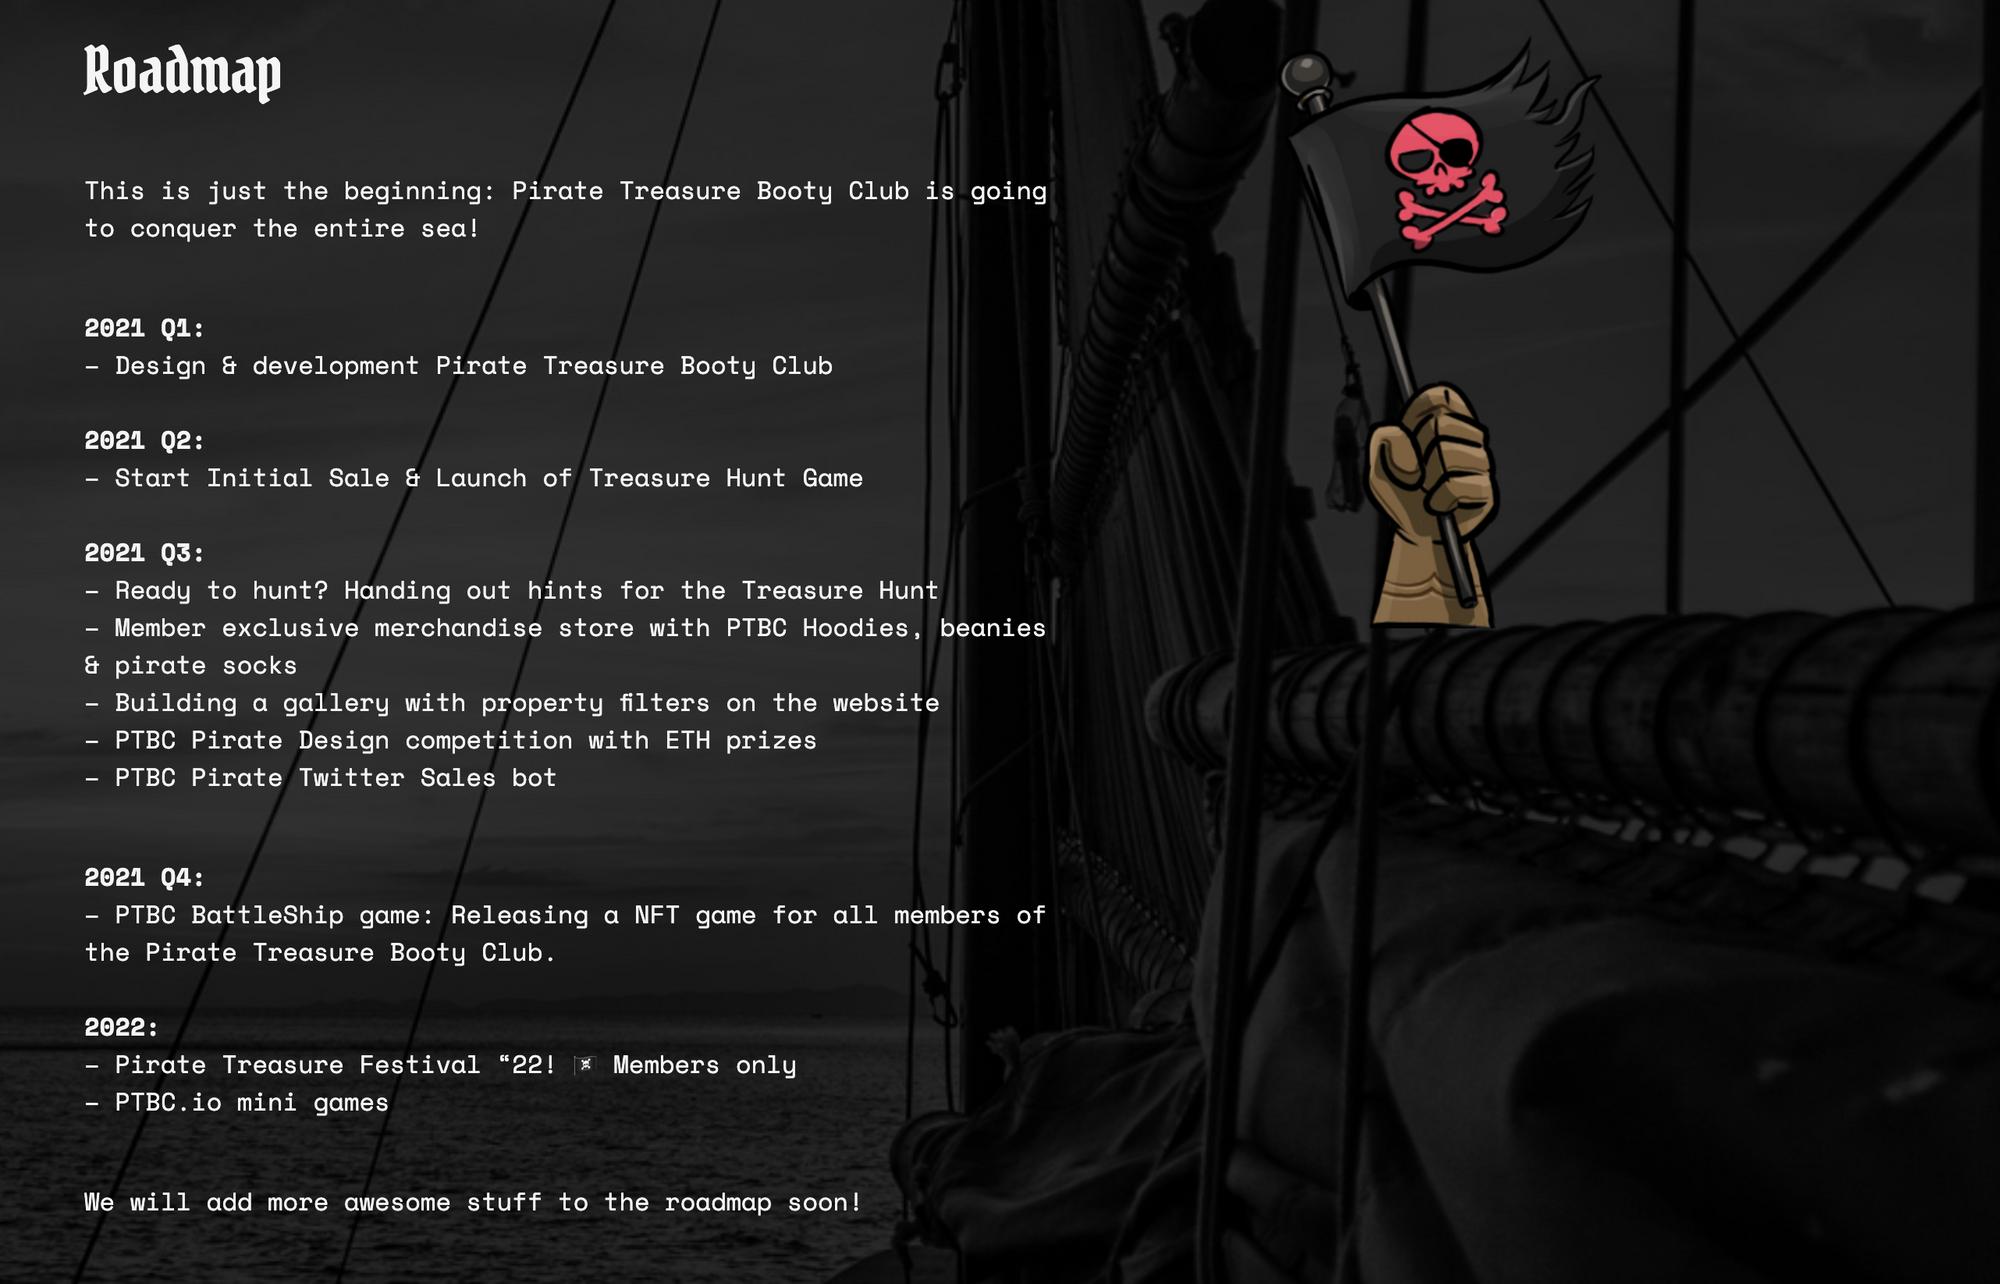 Pirate Treasure Booty Club Roadmap